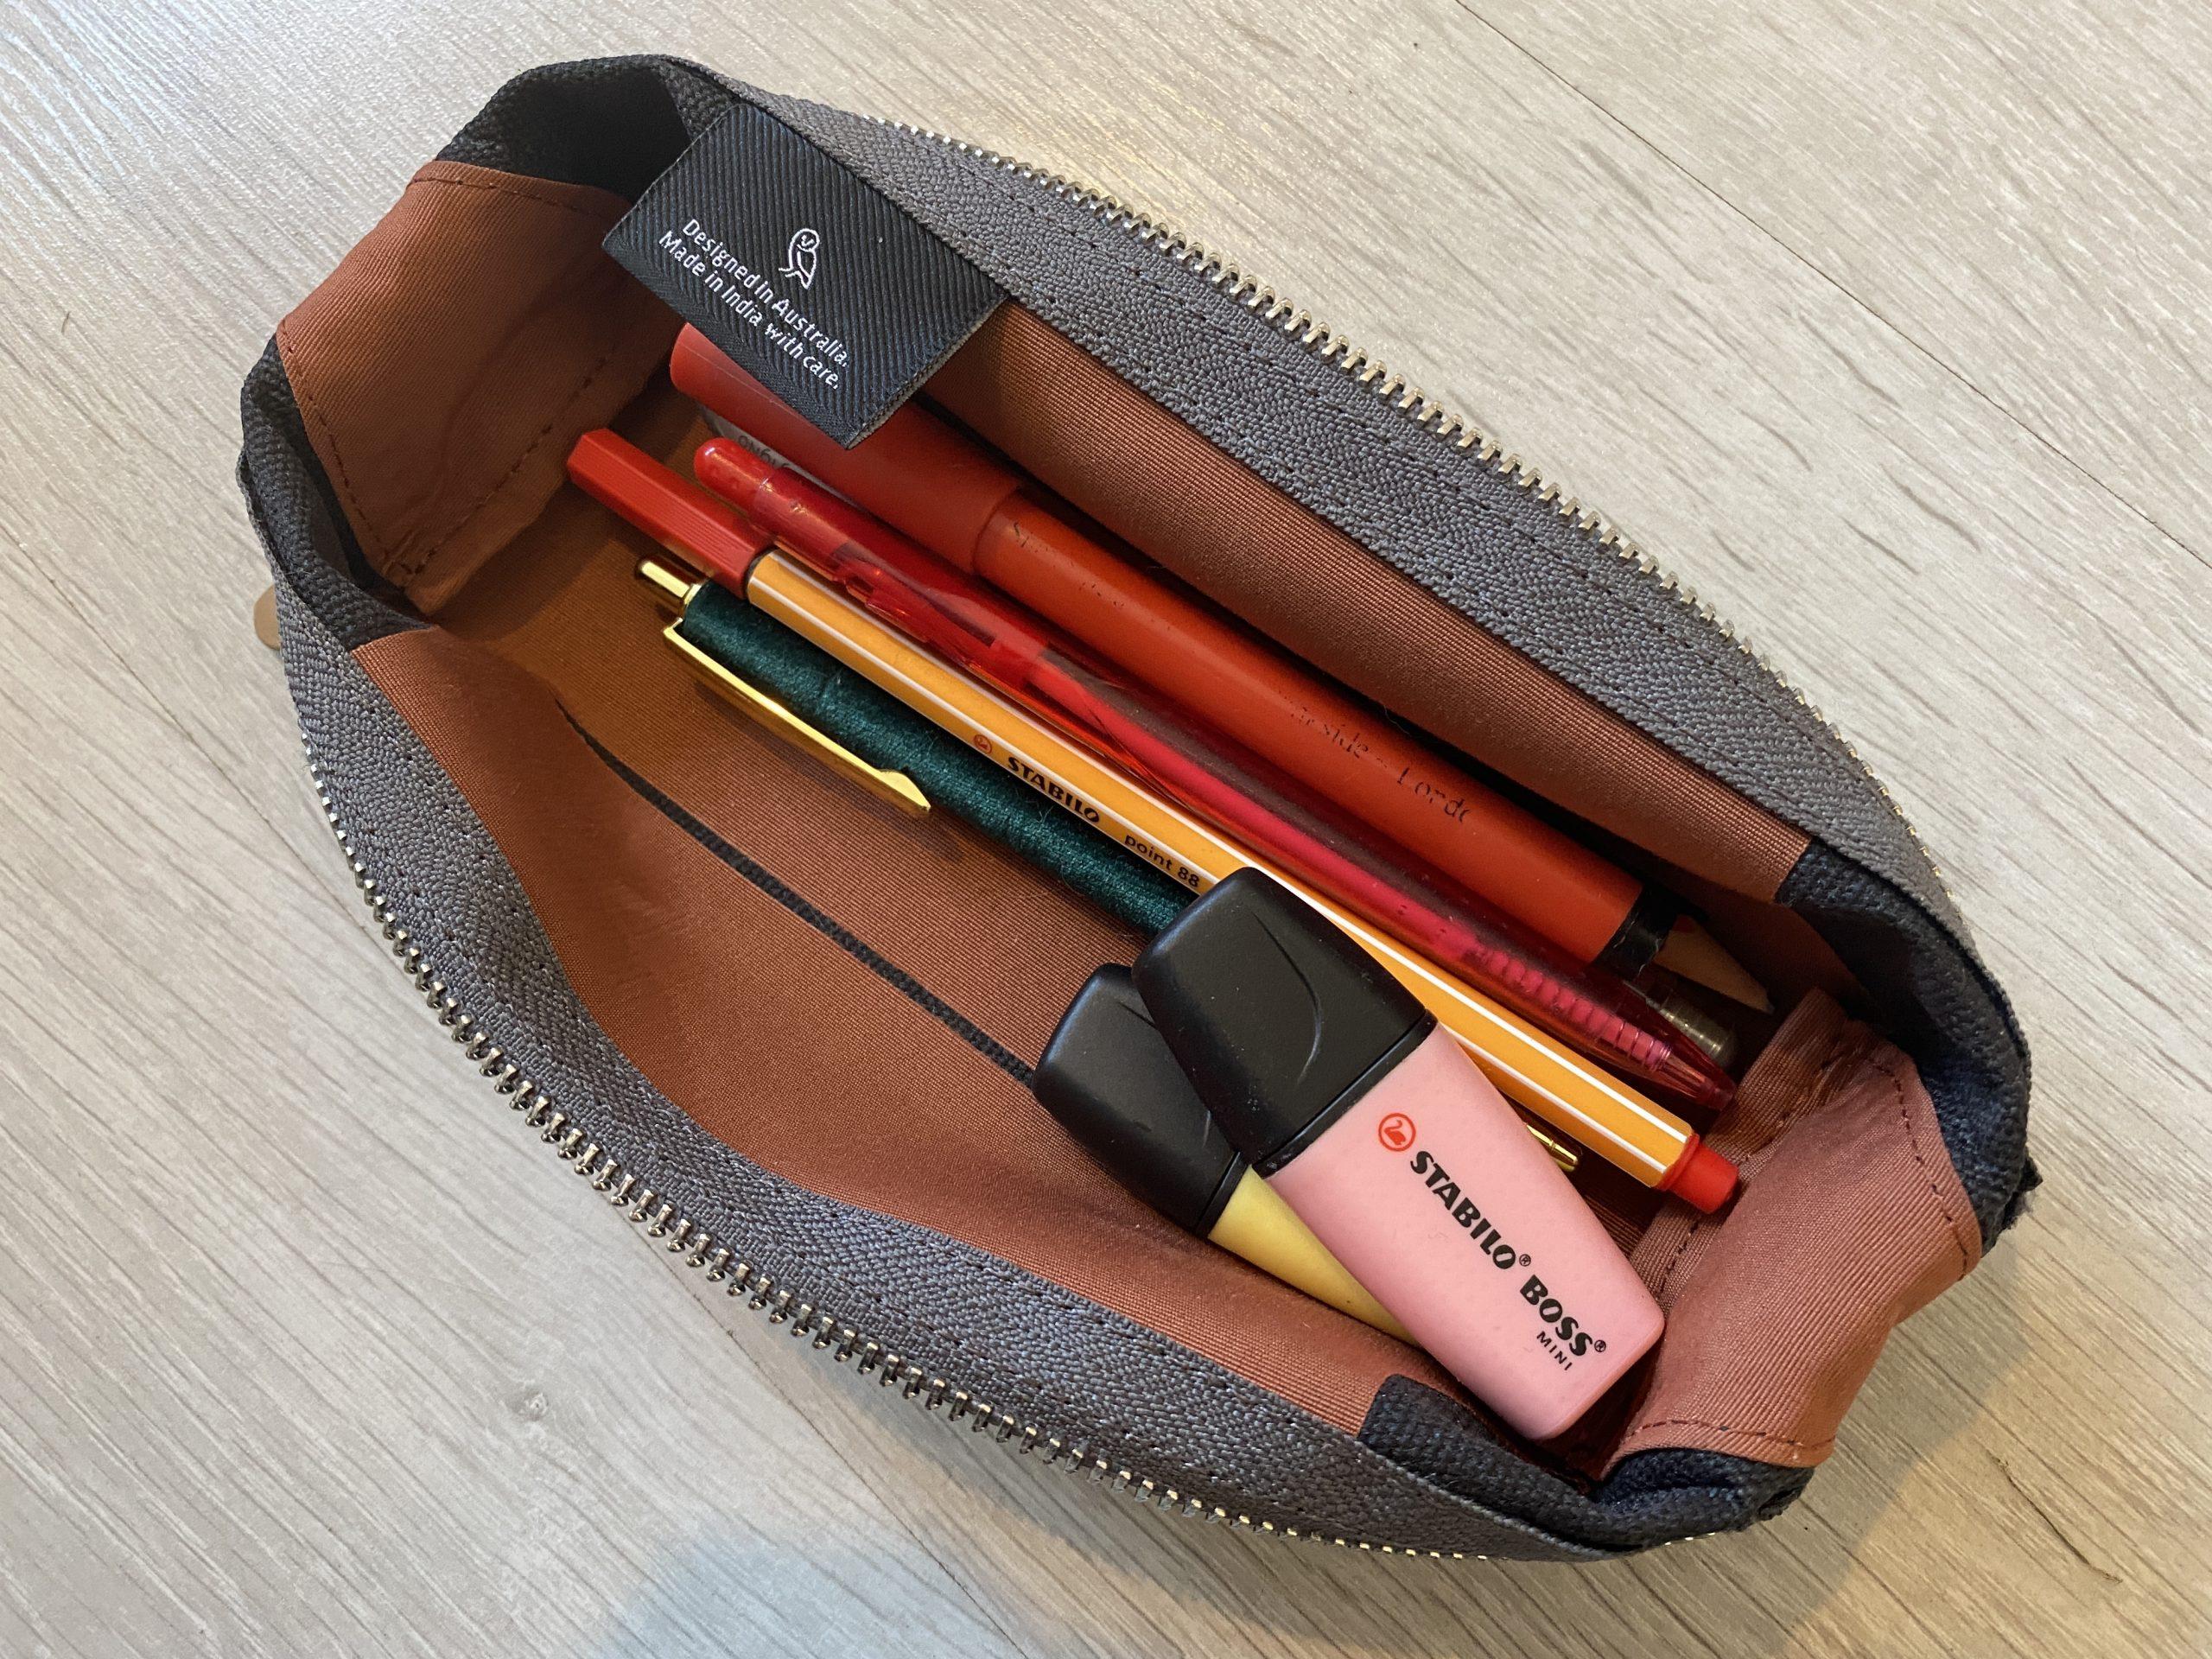 Bellroy Pencil Case Review Tray Mode